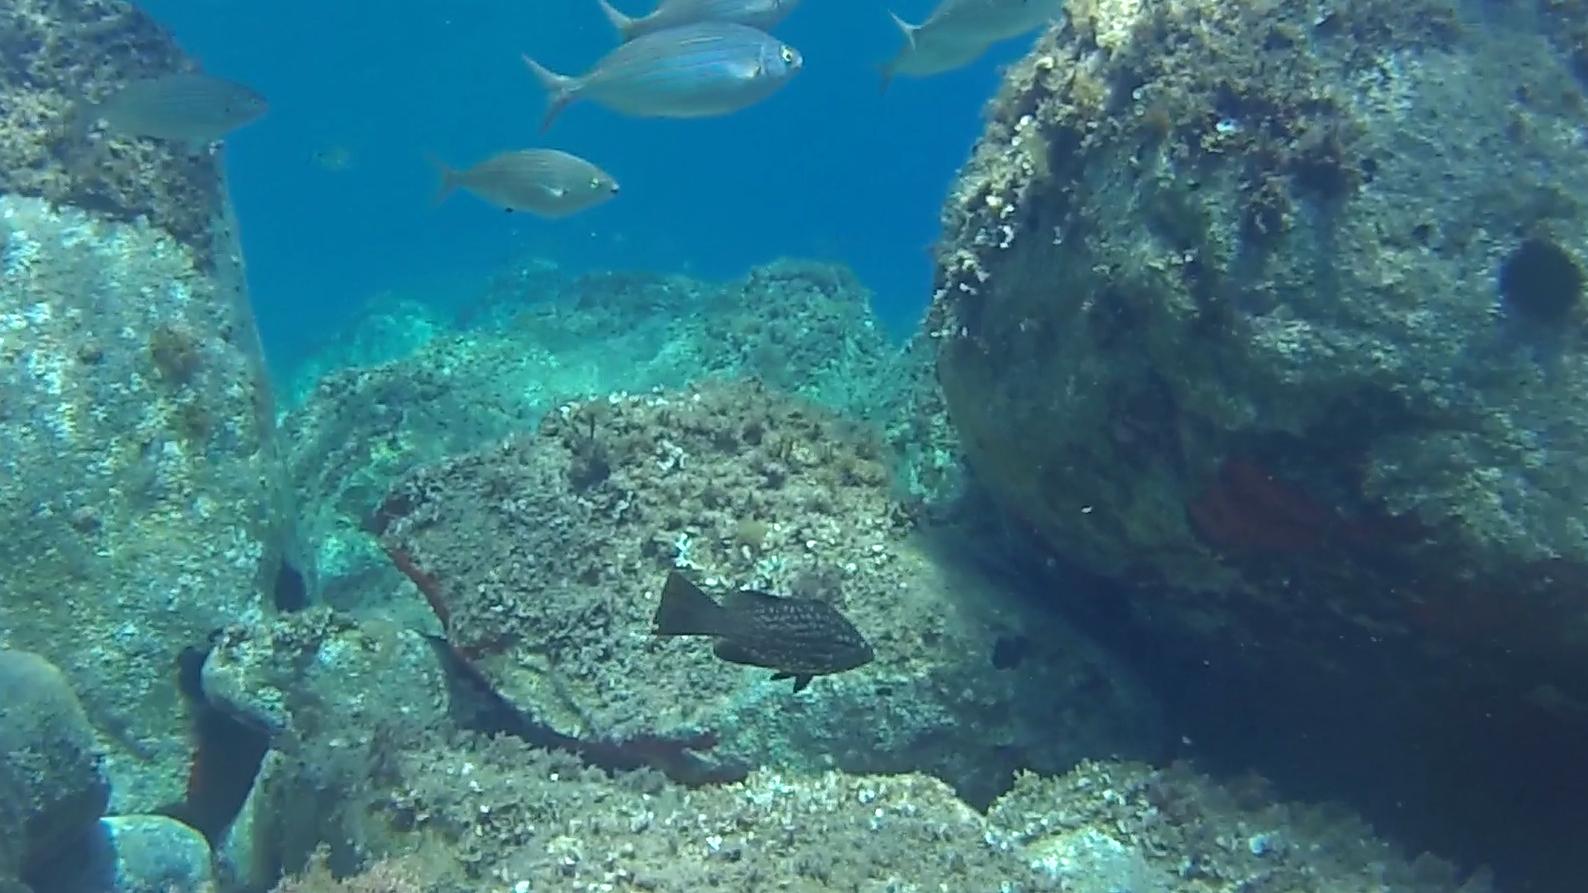 Cernia Dorata Dotto Epinephelus costae Goldblotch grouper intotheblue.it